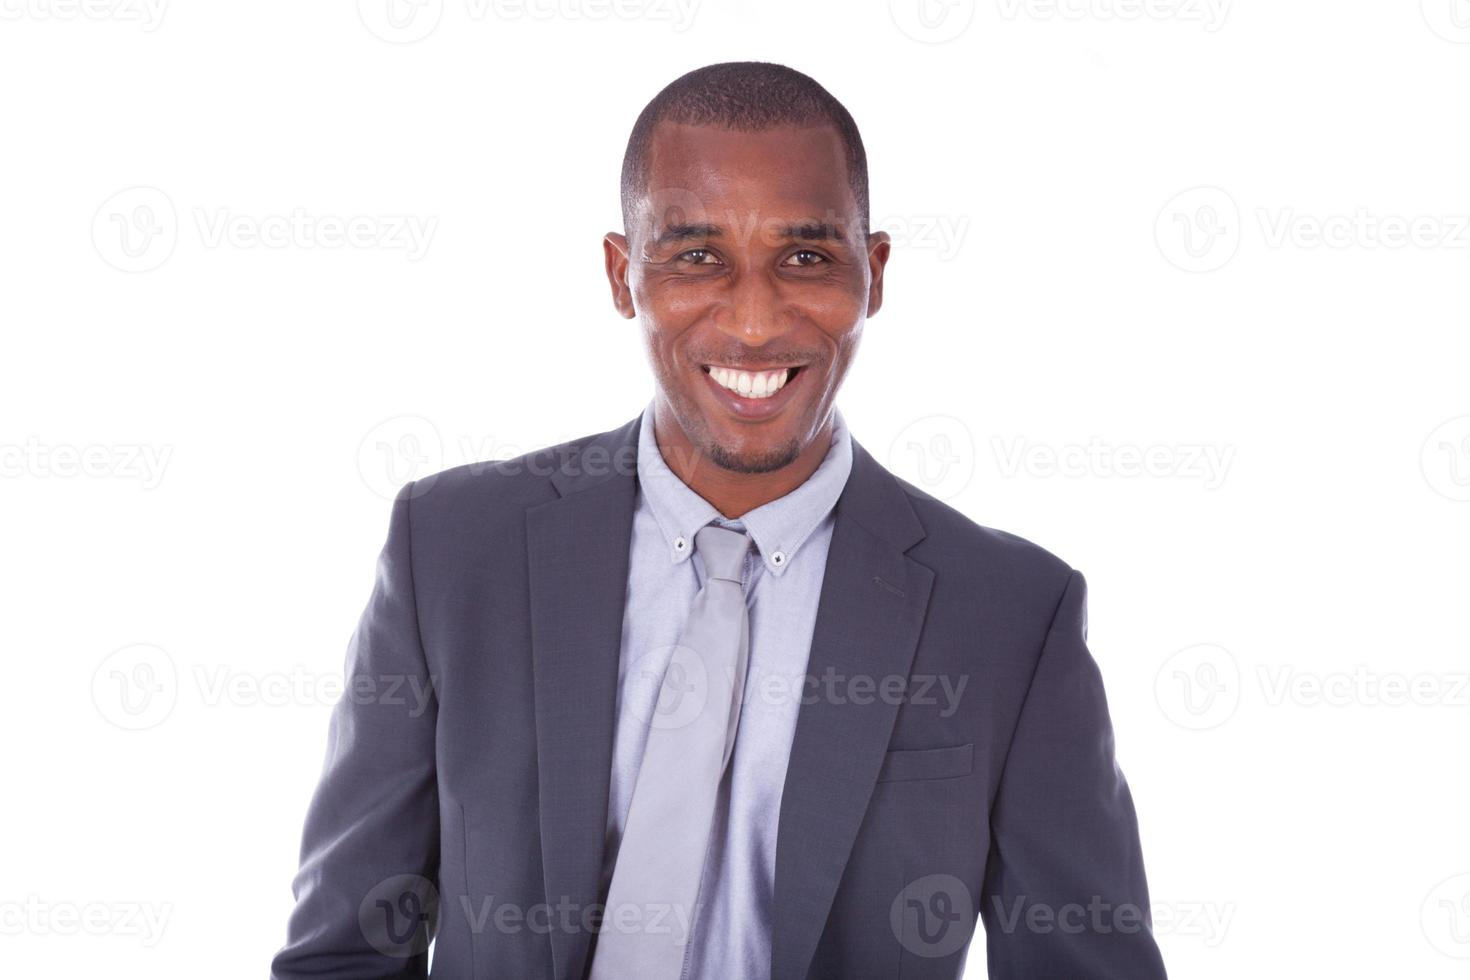 afrikansk amerikansk affärsman över vit bakgrund - svart folk foto